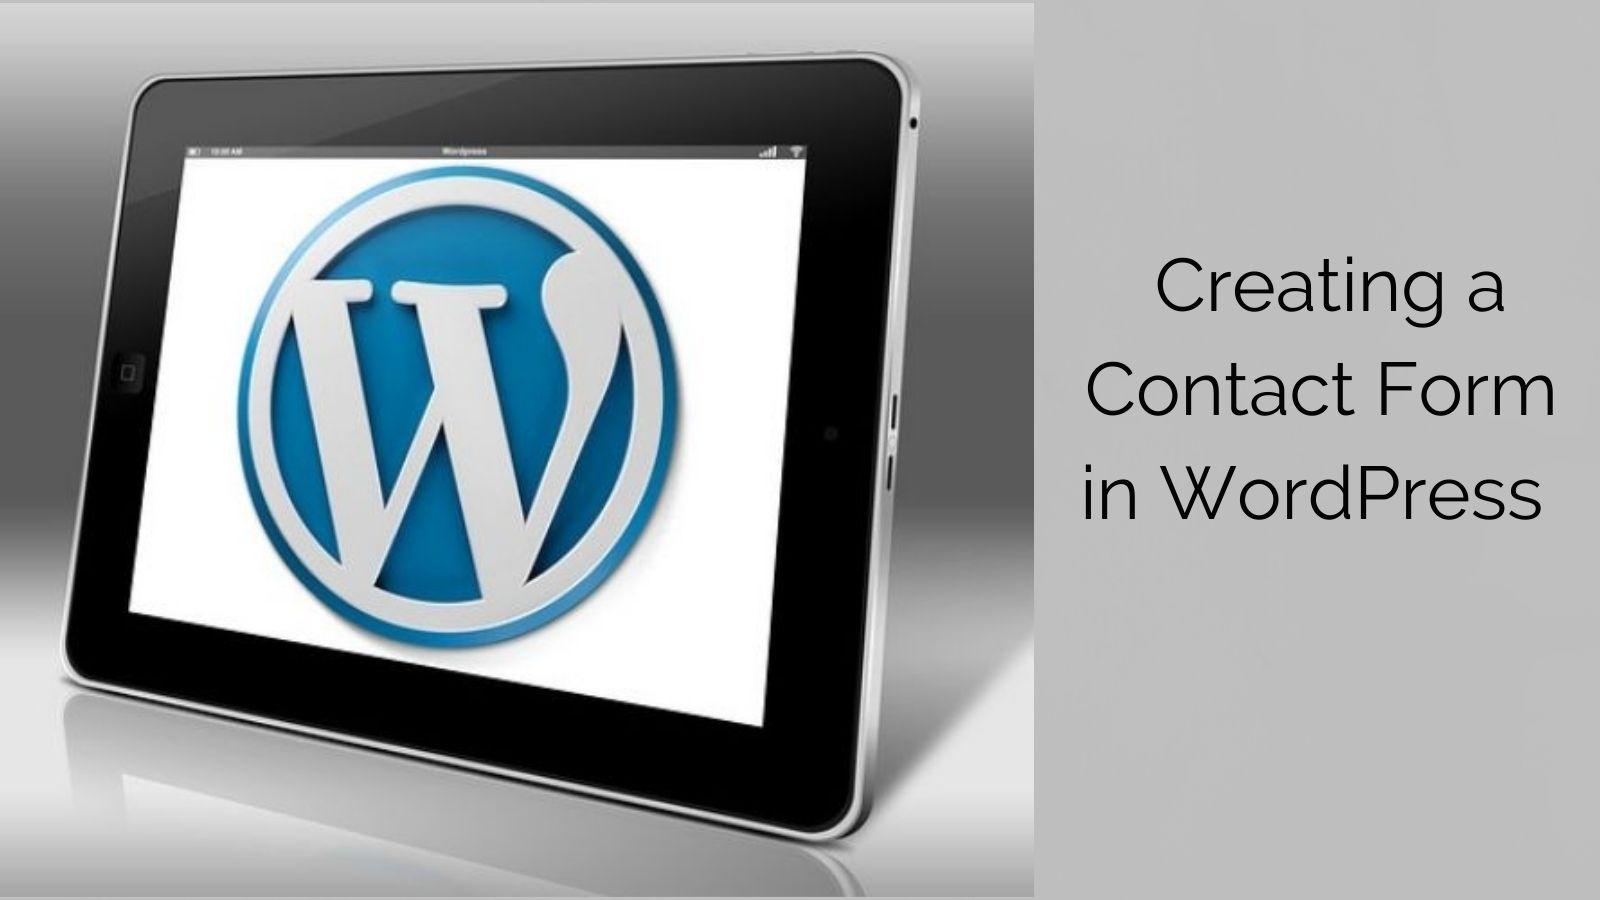 How To Create A Contact Form In WordPress Tutorial - WordPress Logo